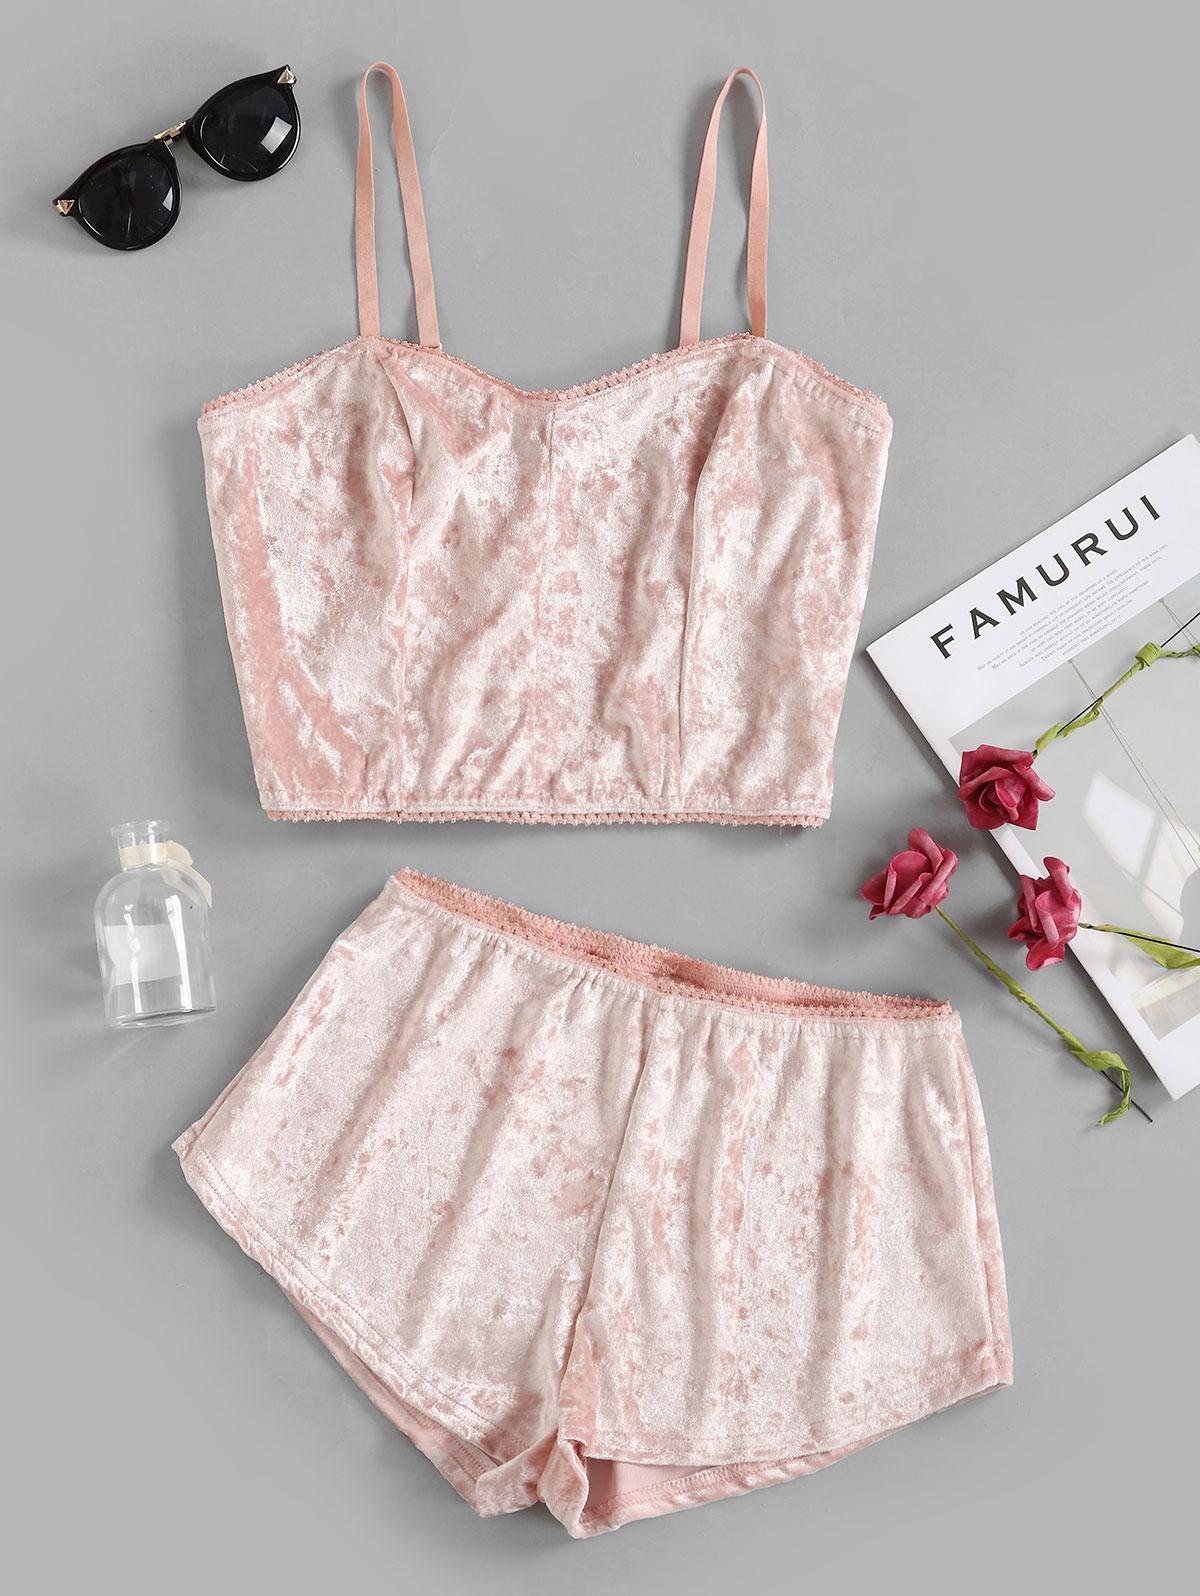 Velvet Cami Top and Shorts Lingerie Set